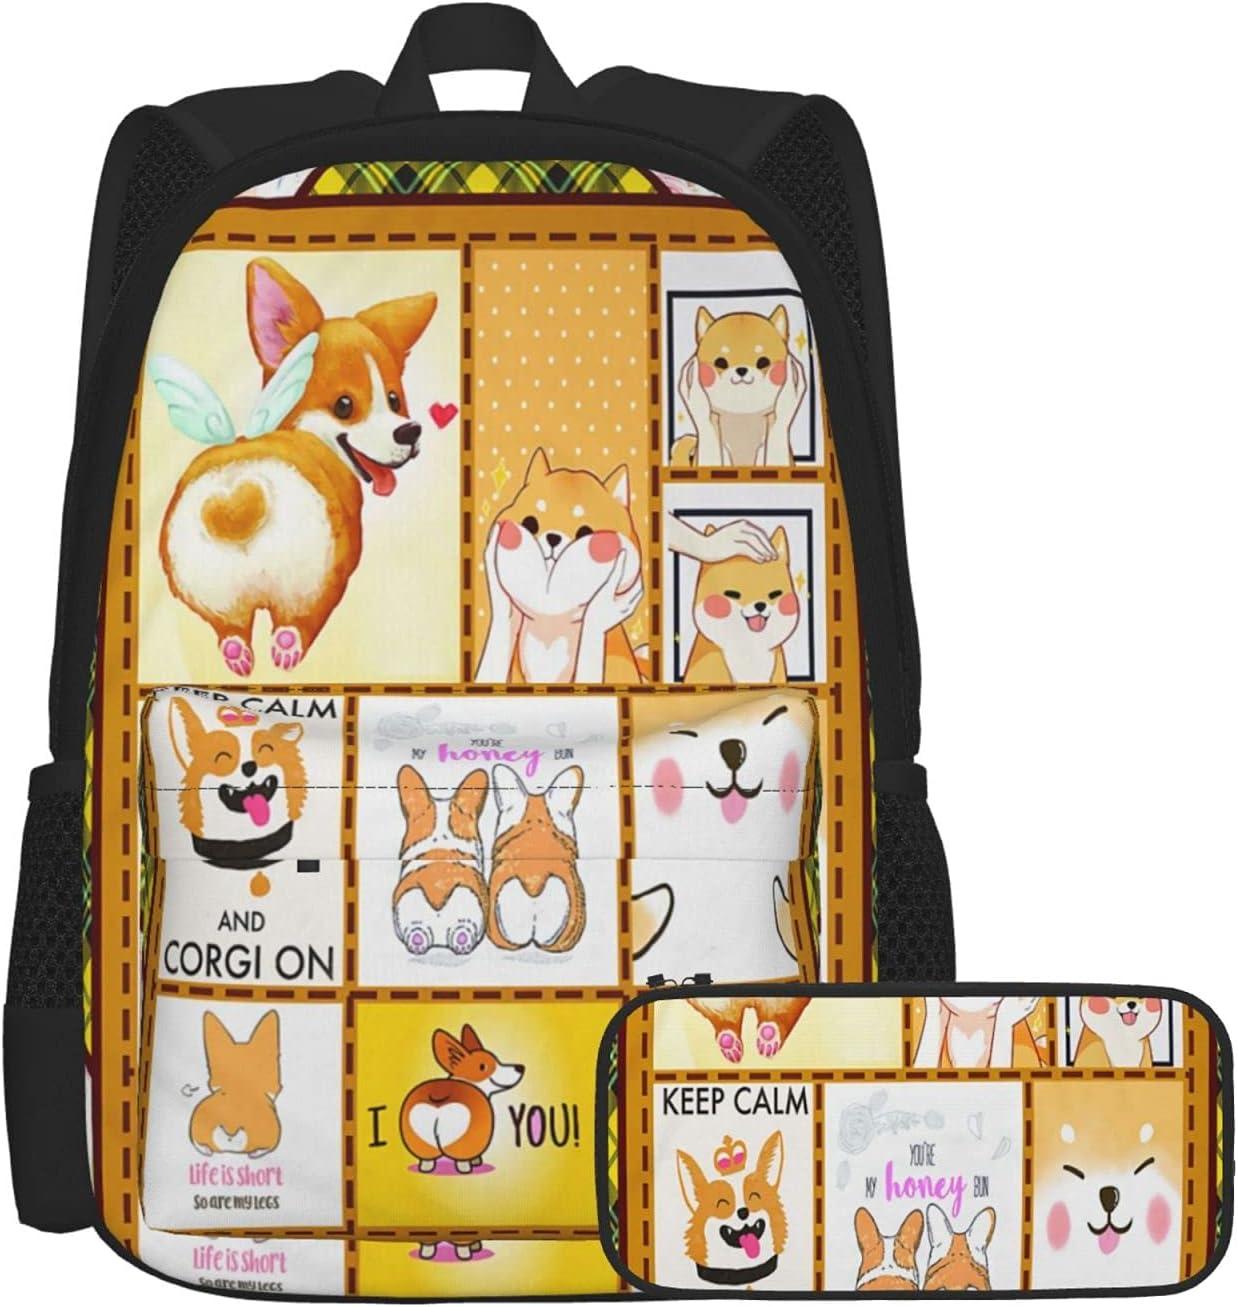 OYQGEJGPJA 2 Piece Set Keep Calm and Backpack Bag L Corgi School Virginia Beach Gifts Mall